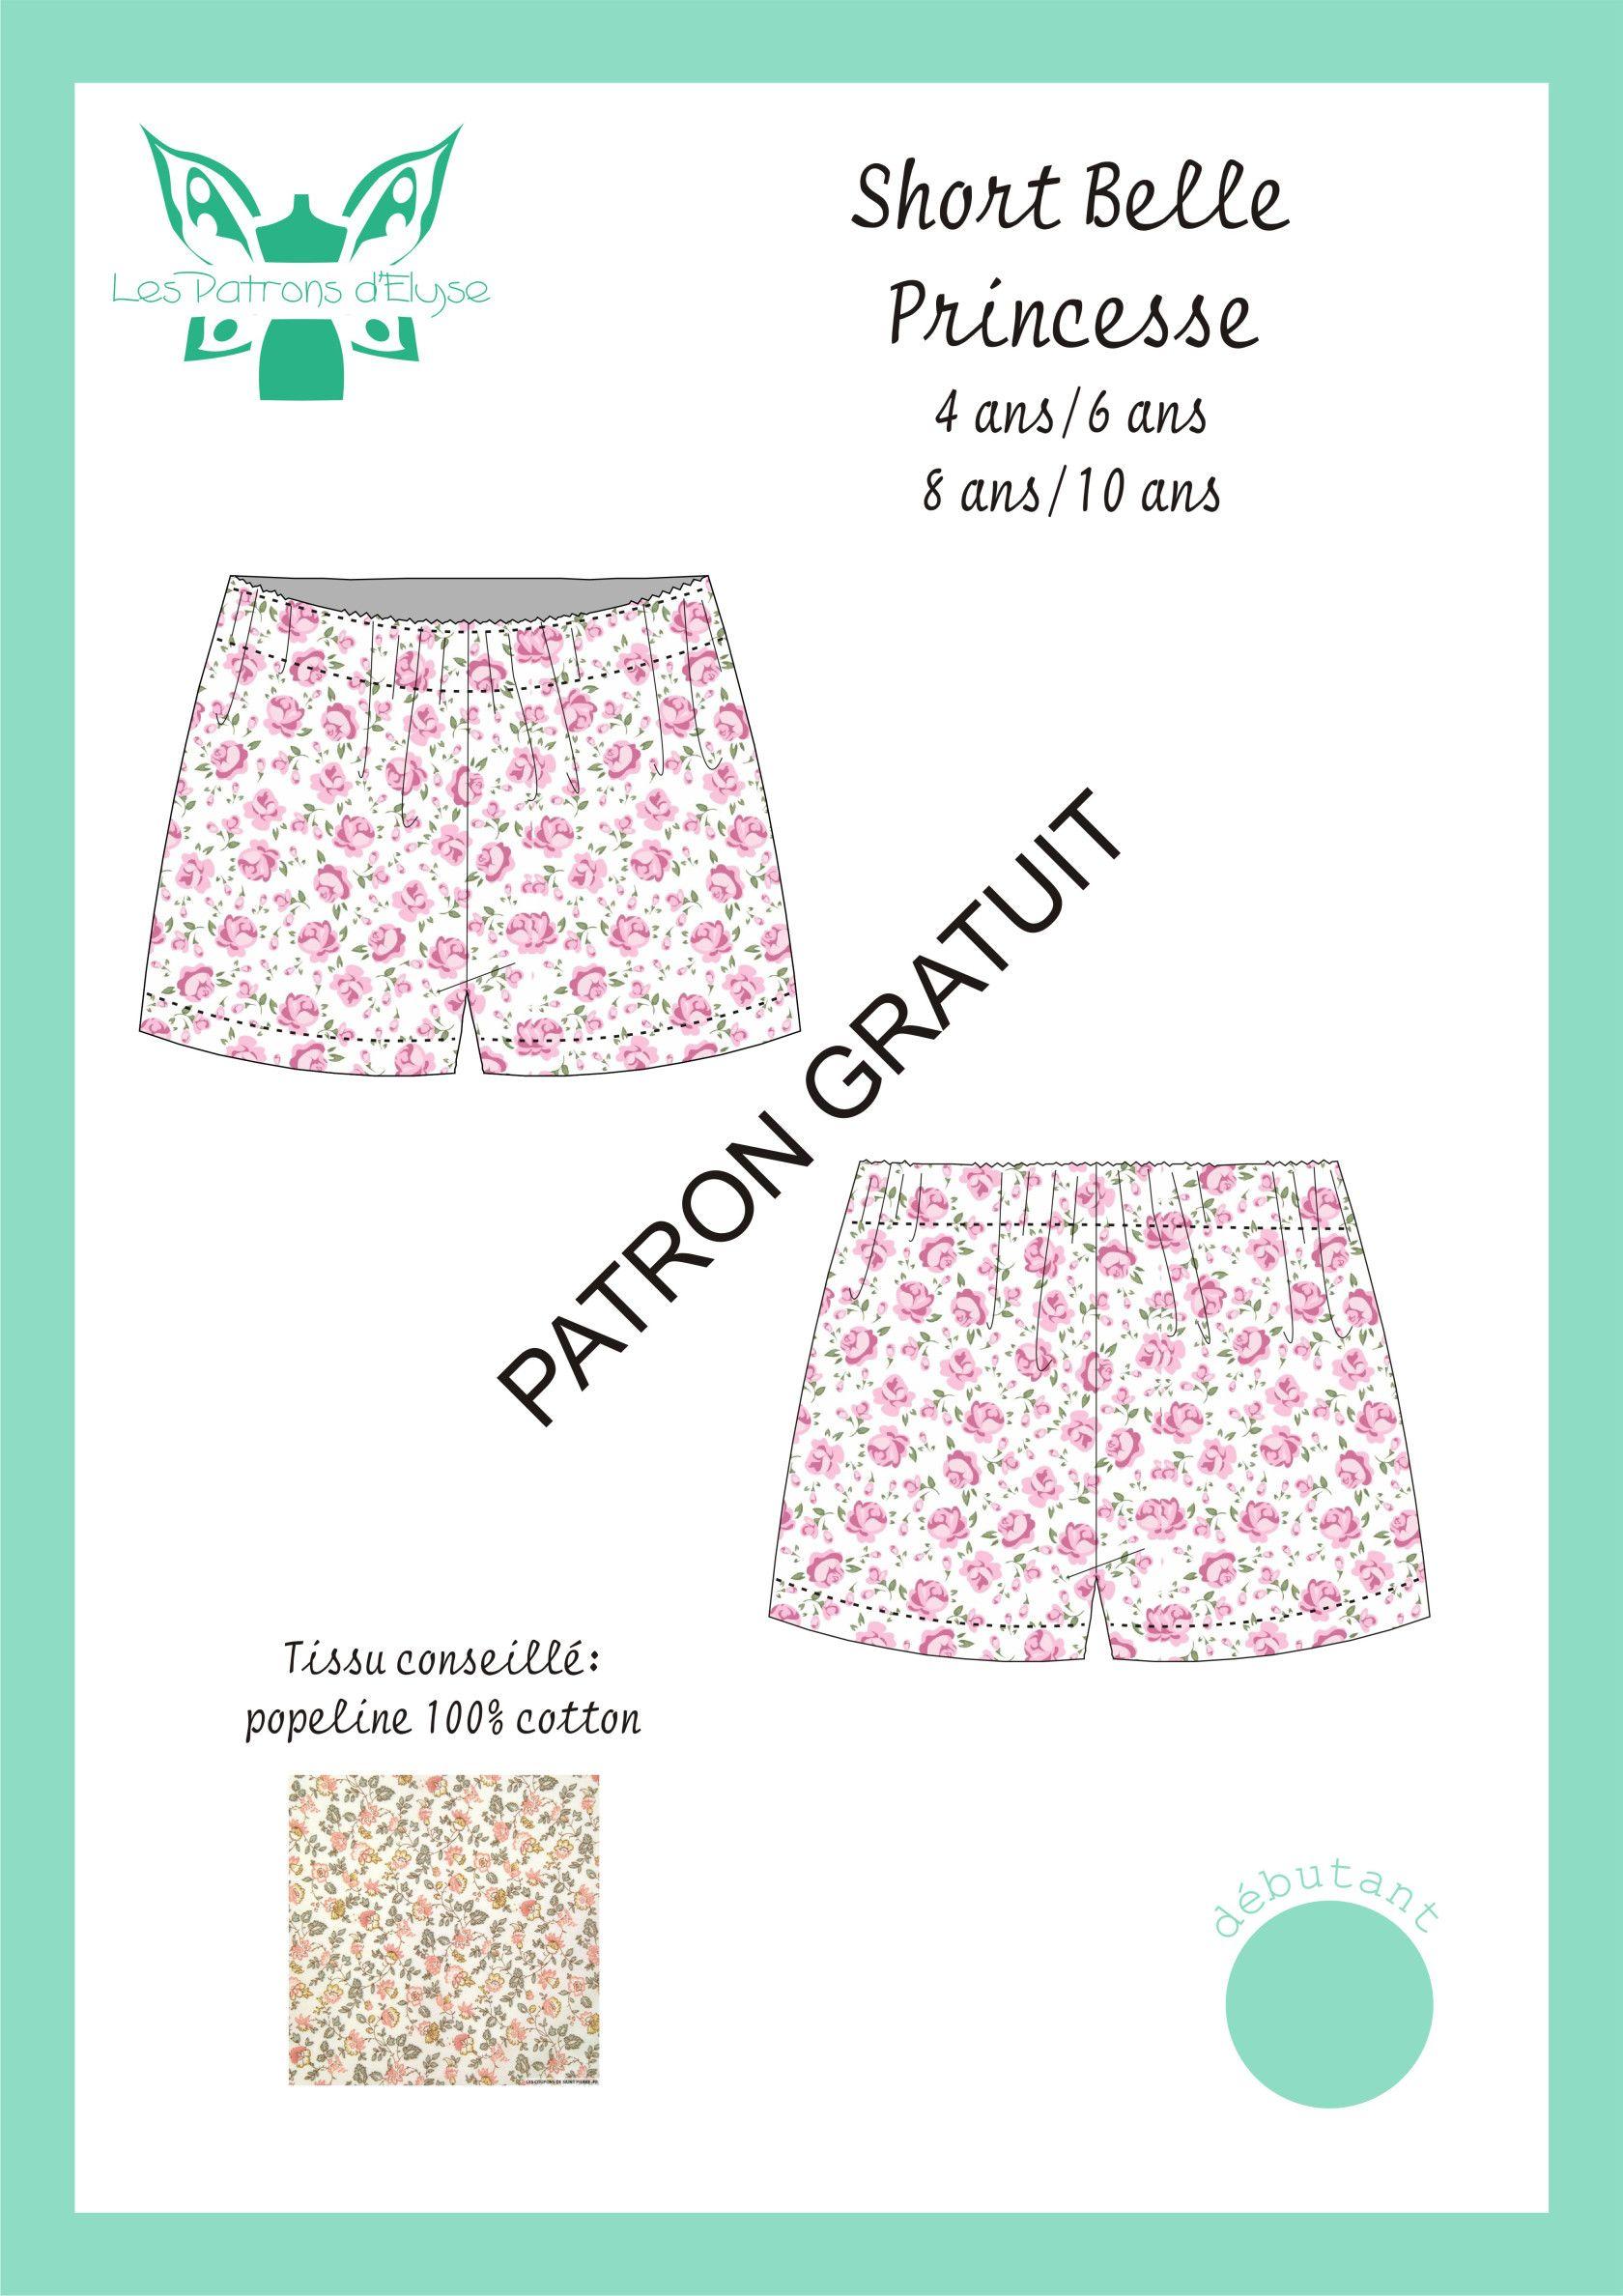 Short Belle Princesse | Tuto couture, Tutos